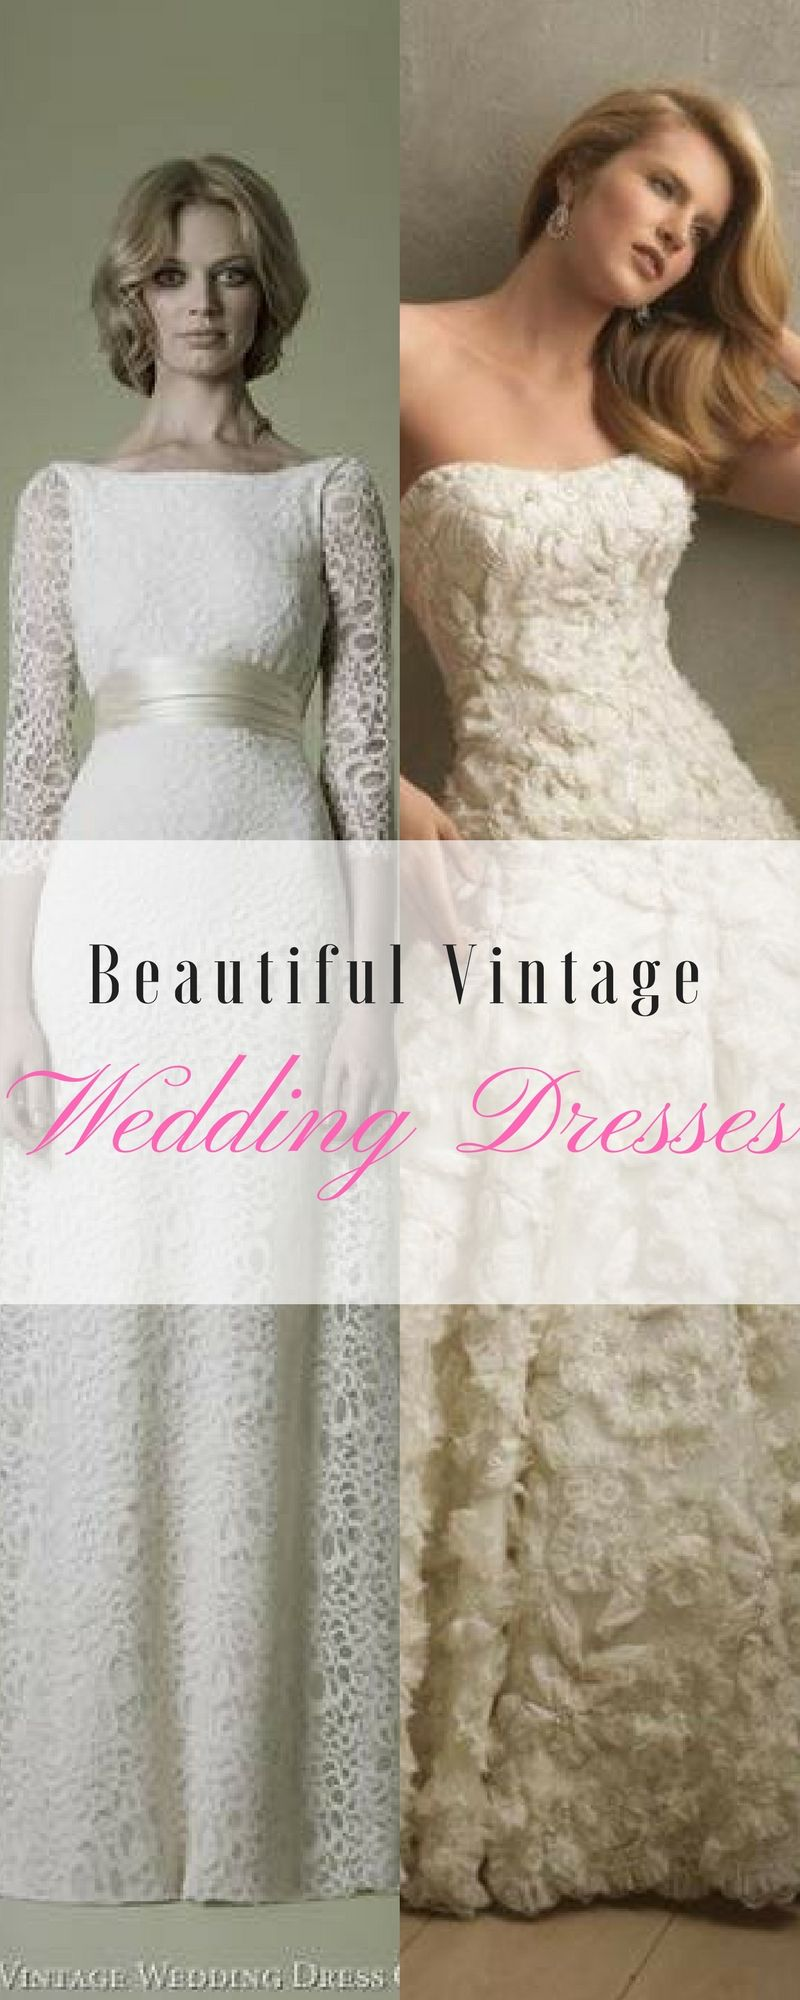 Beautiful Vintage Wedding Dresses | Pinterest | Vintage weddings ...